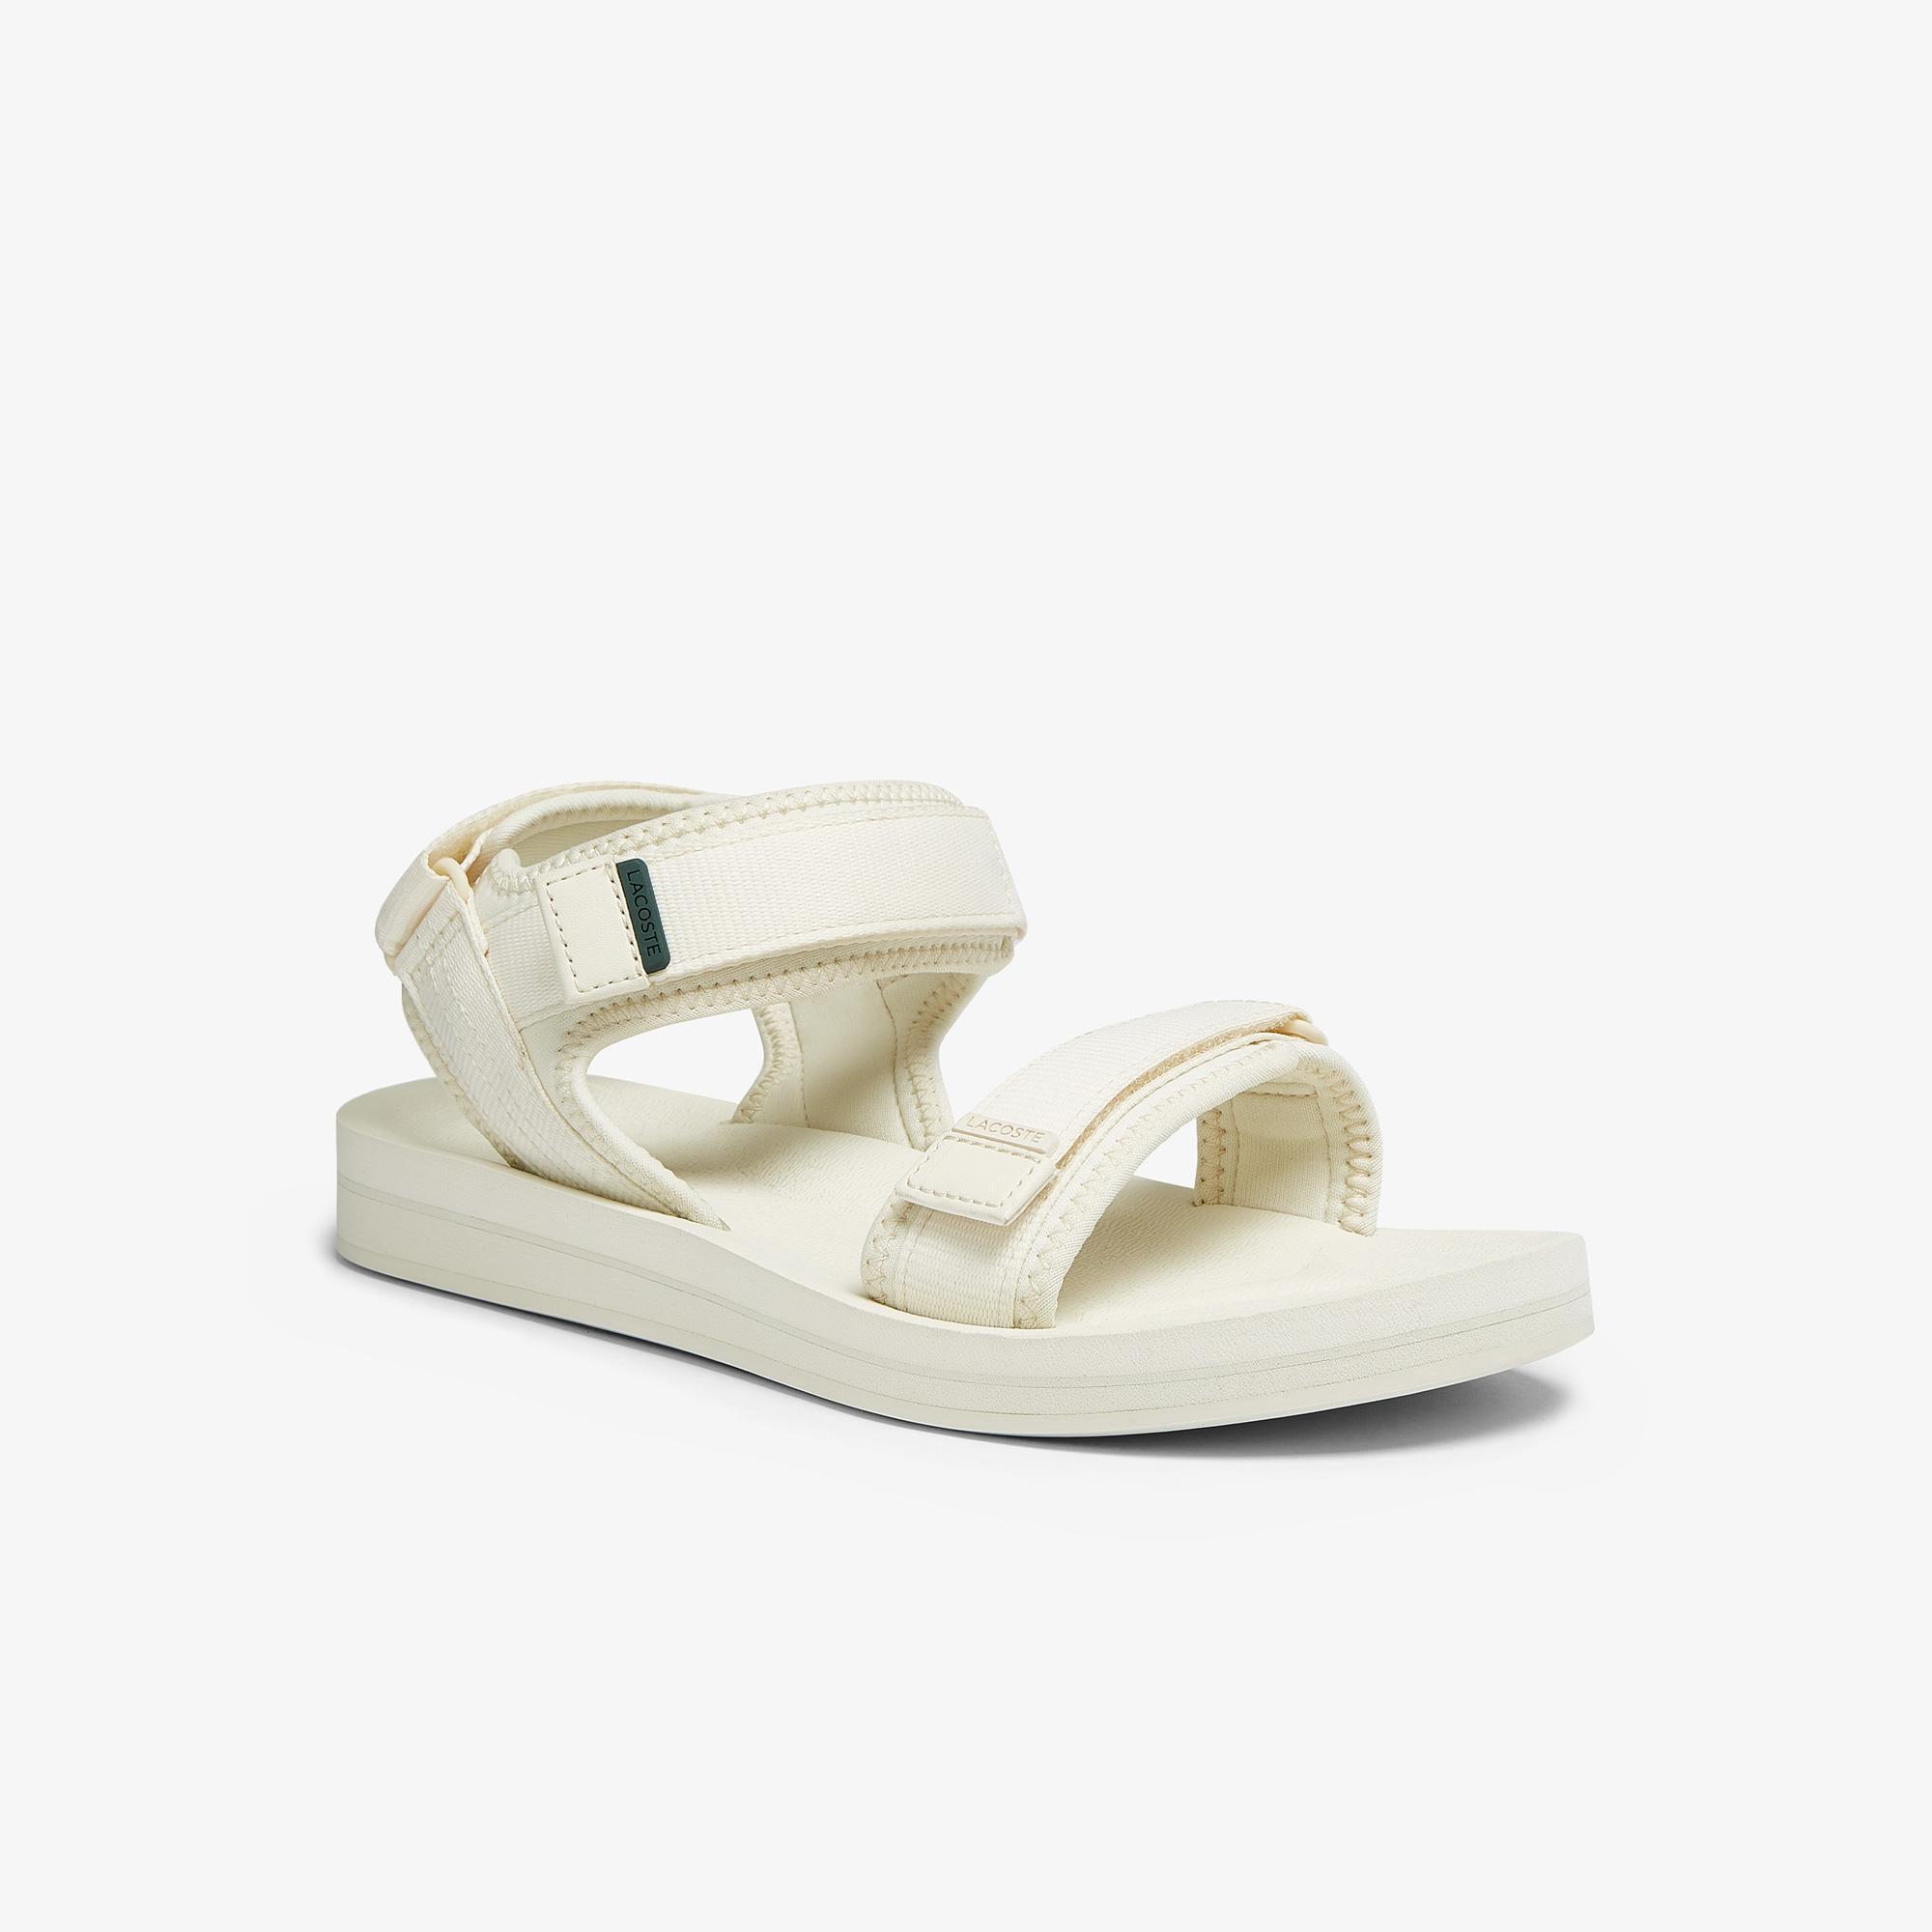 Lacoste Suruga 0921 1 Cma Erkek Beyaz Sandalet